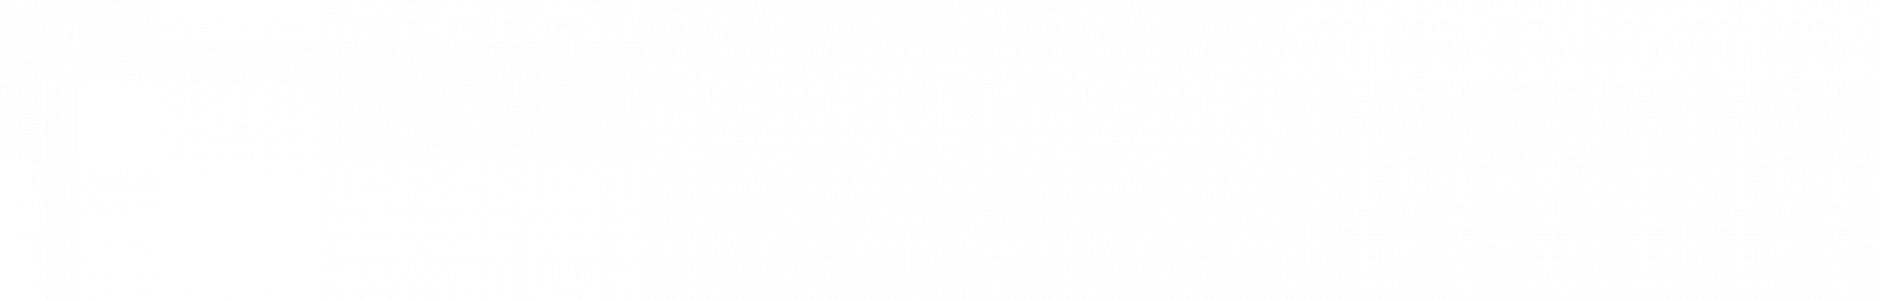 moxa-tn-g4500-series-image-1